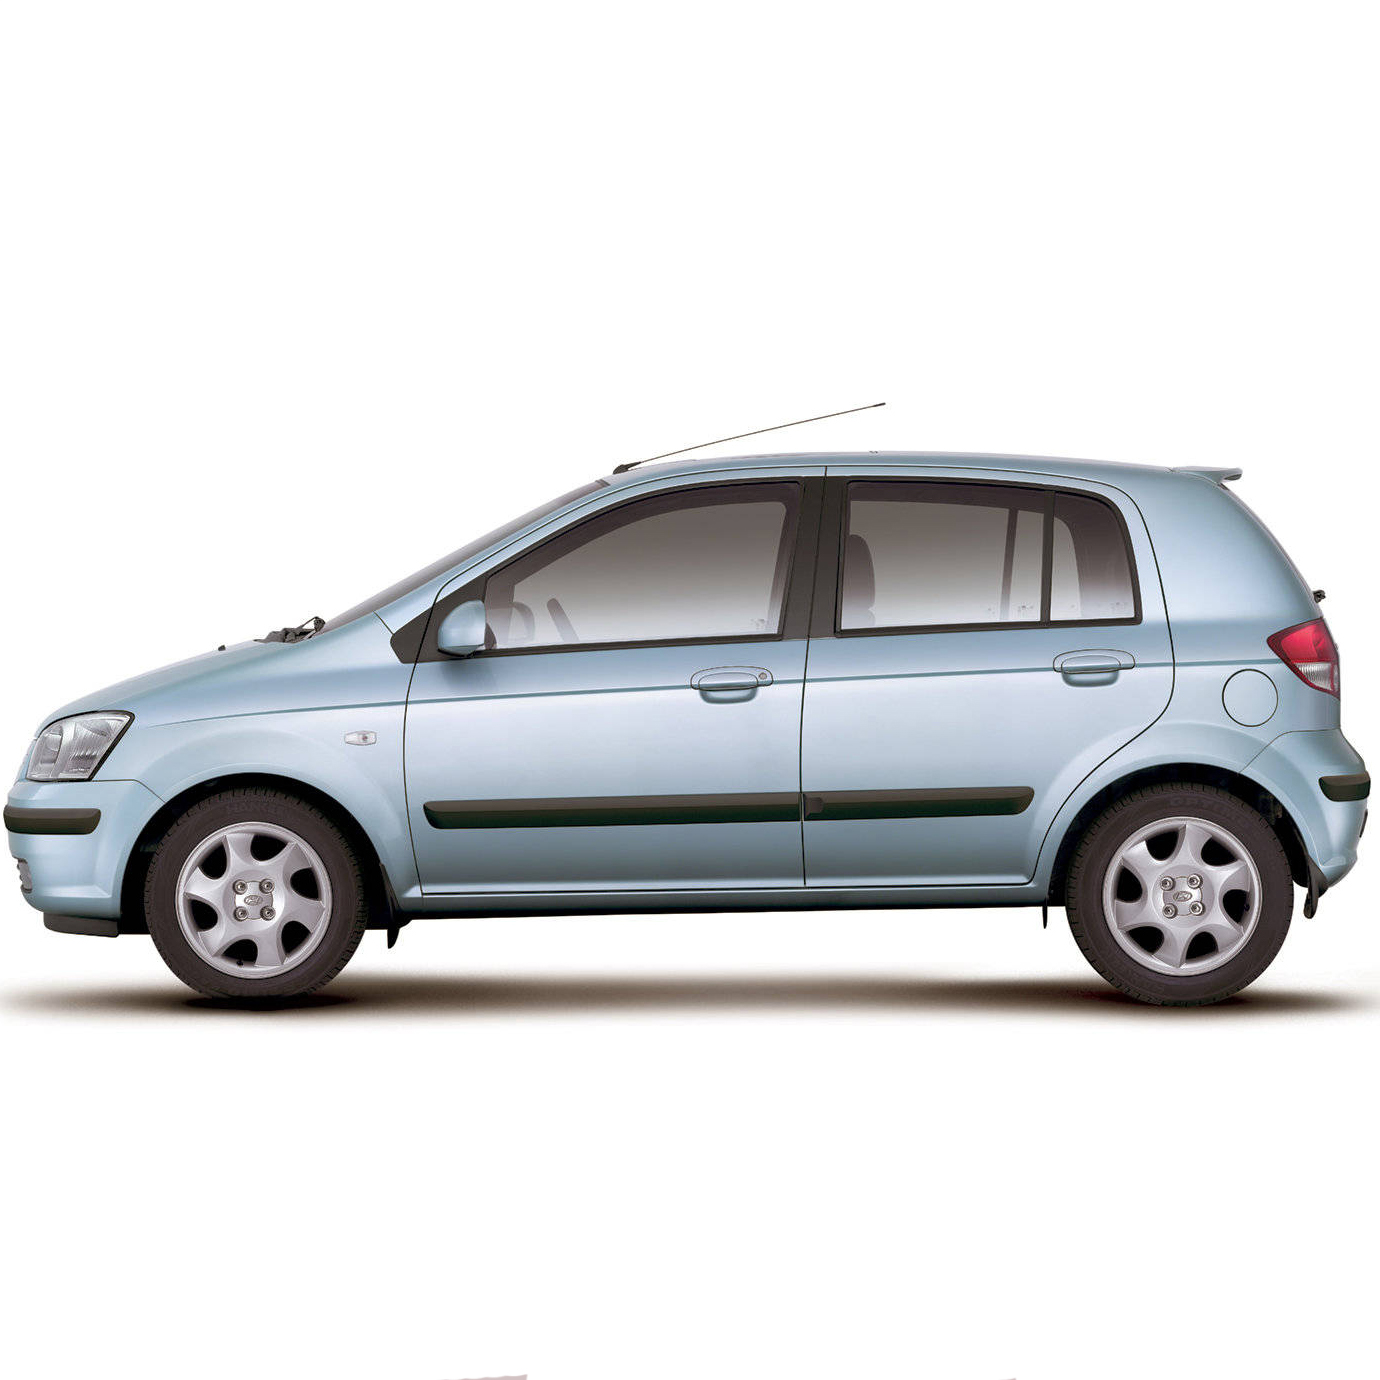 Hyundai Getz 2002 Onwards